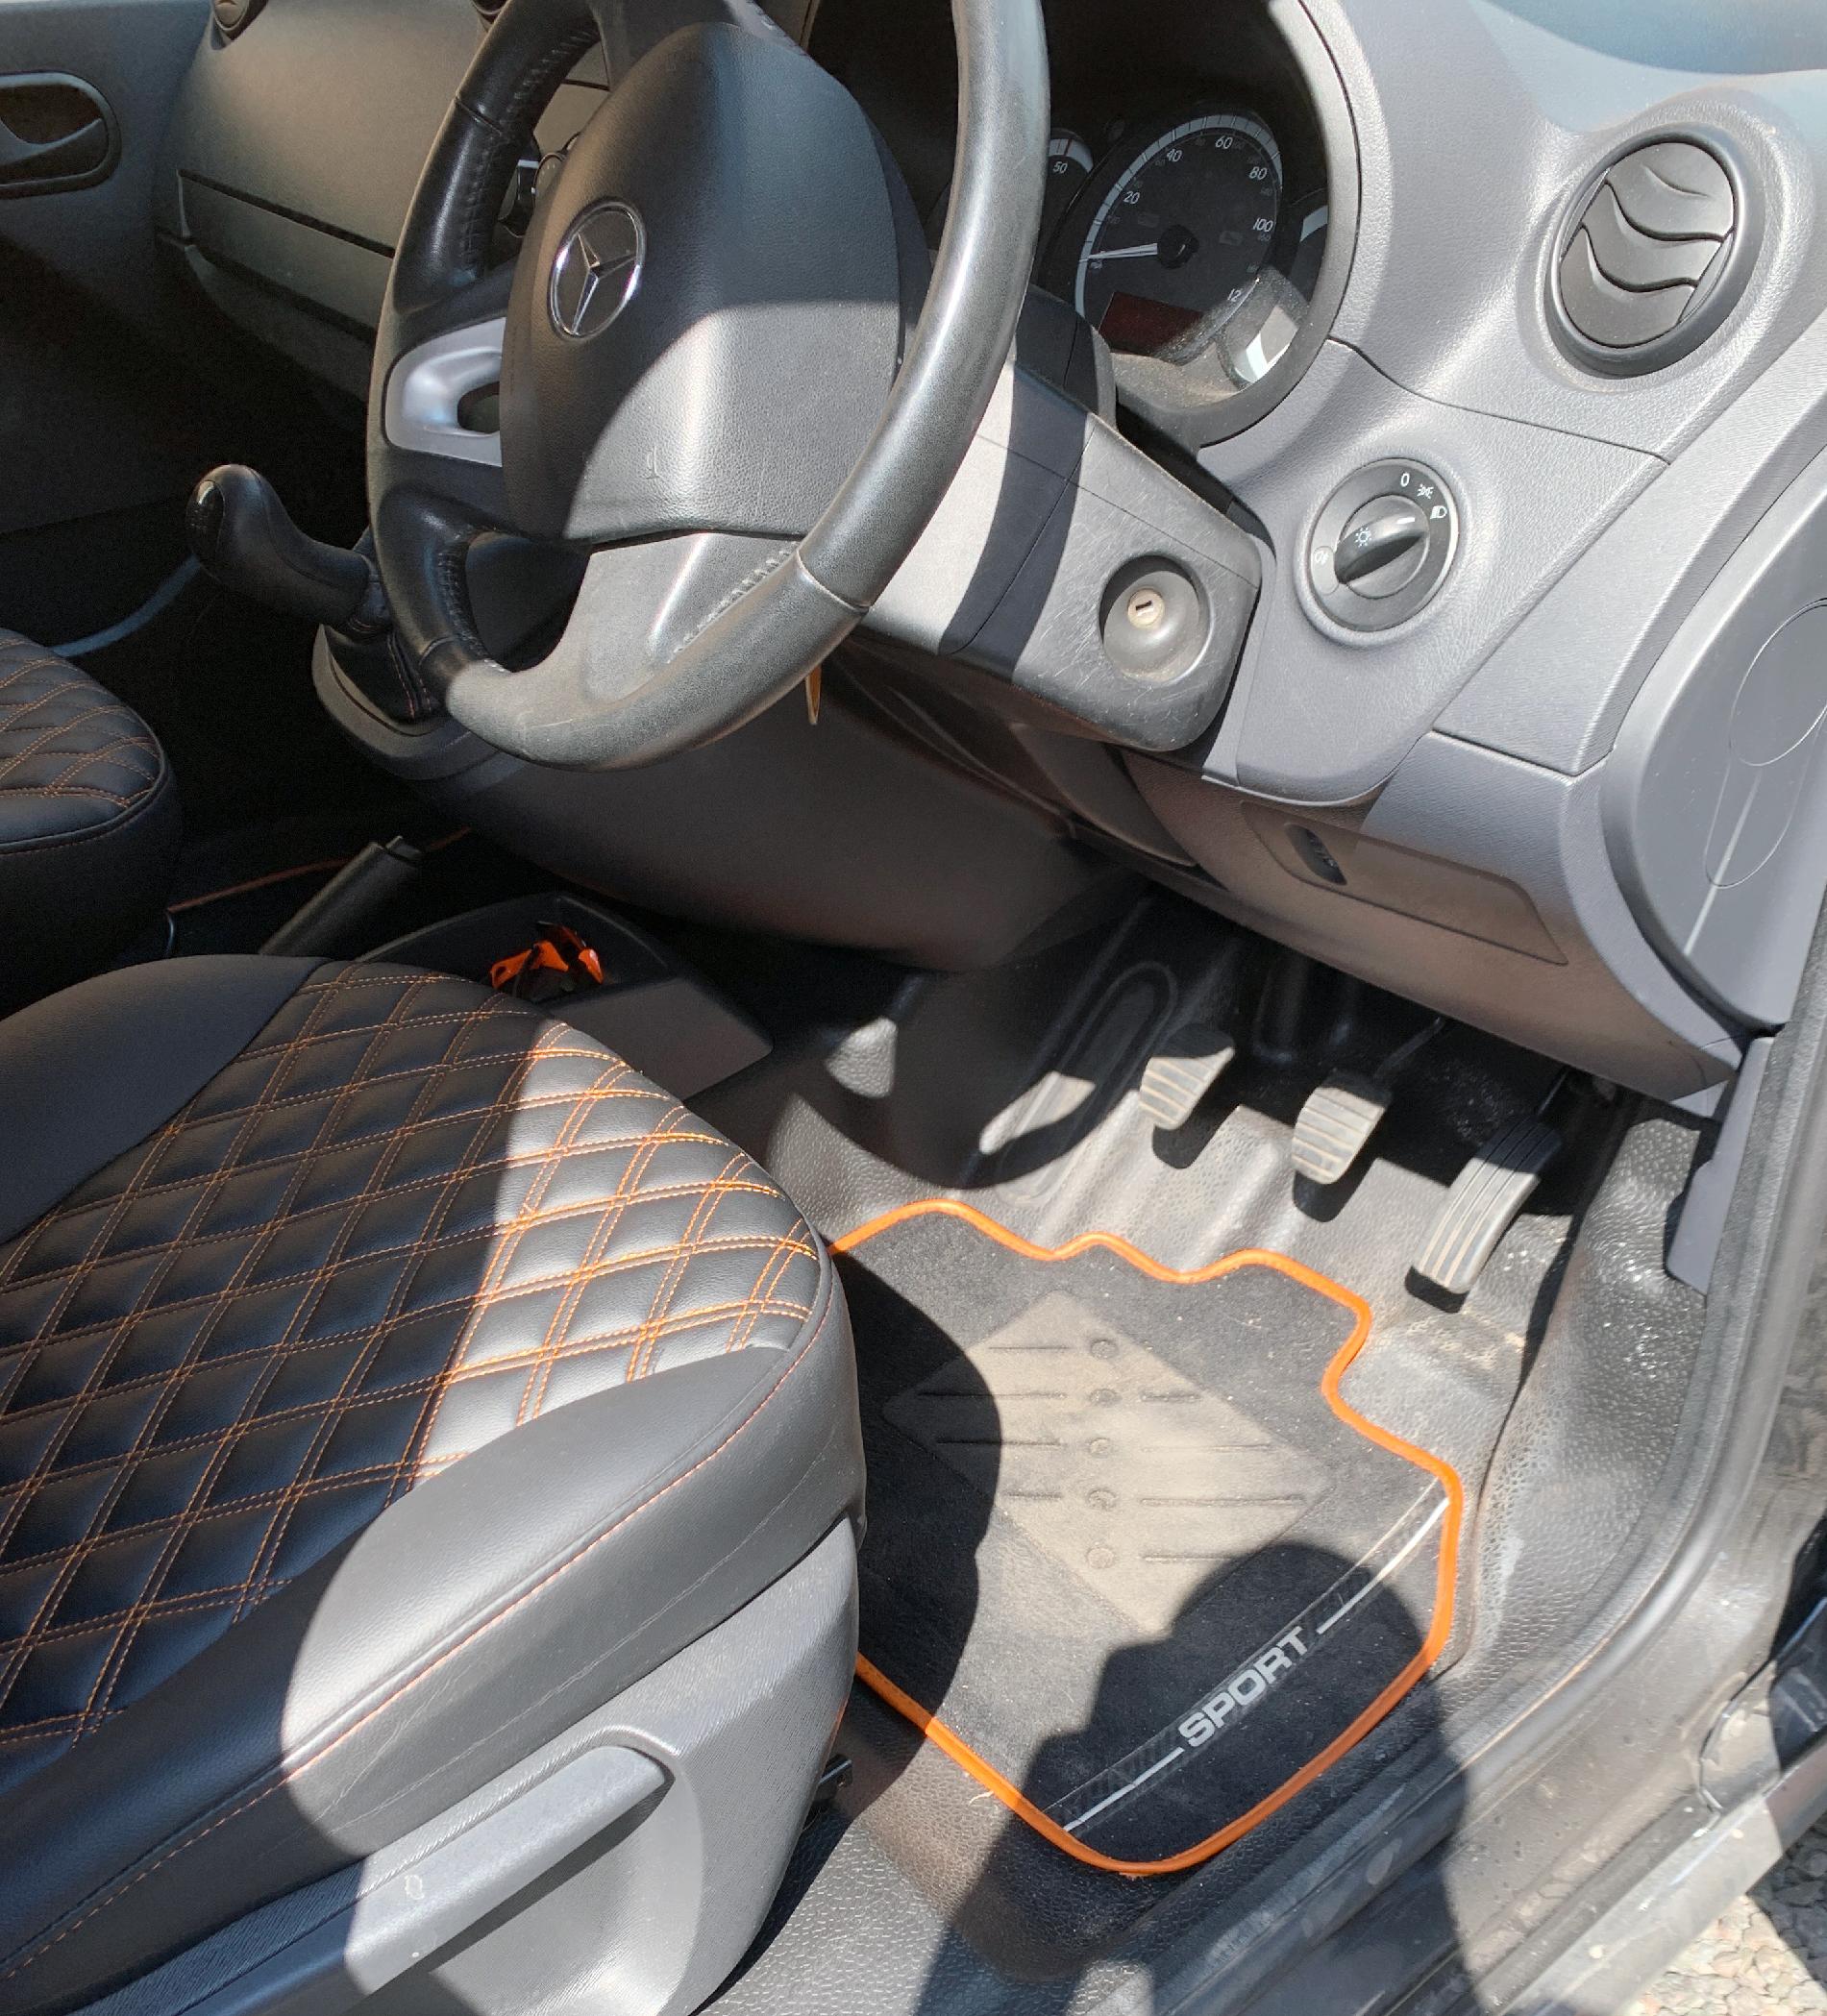 Grey+with+orange+accent+Mercades+van+upholstery